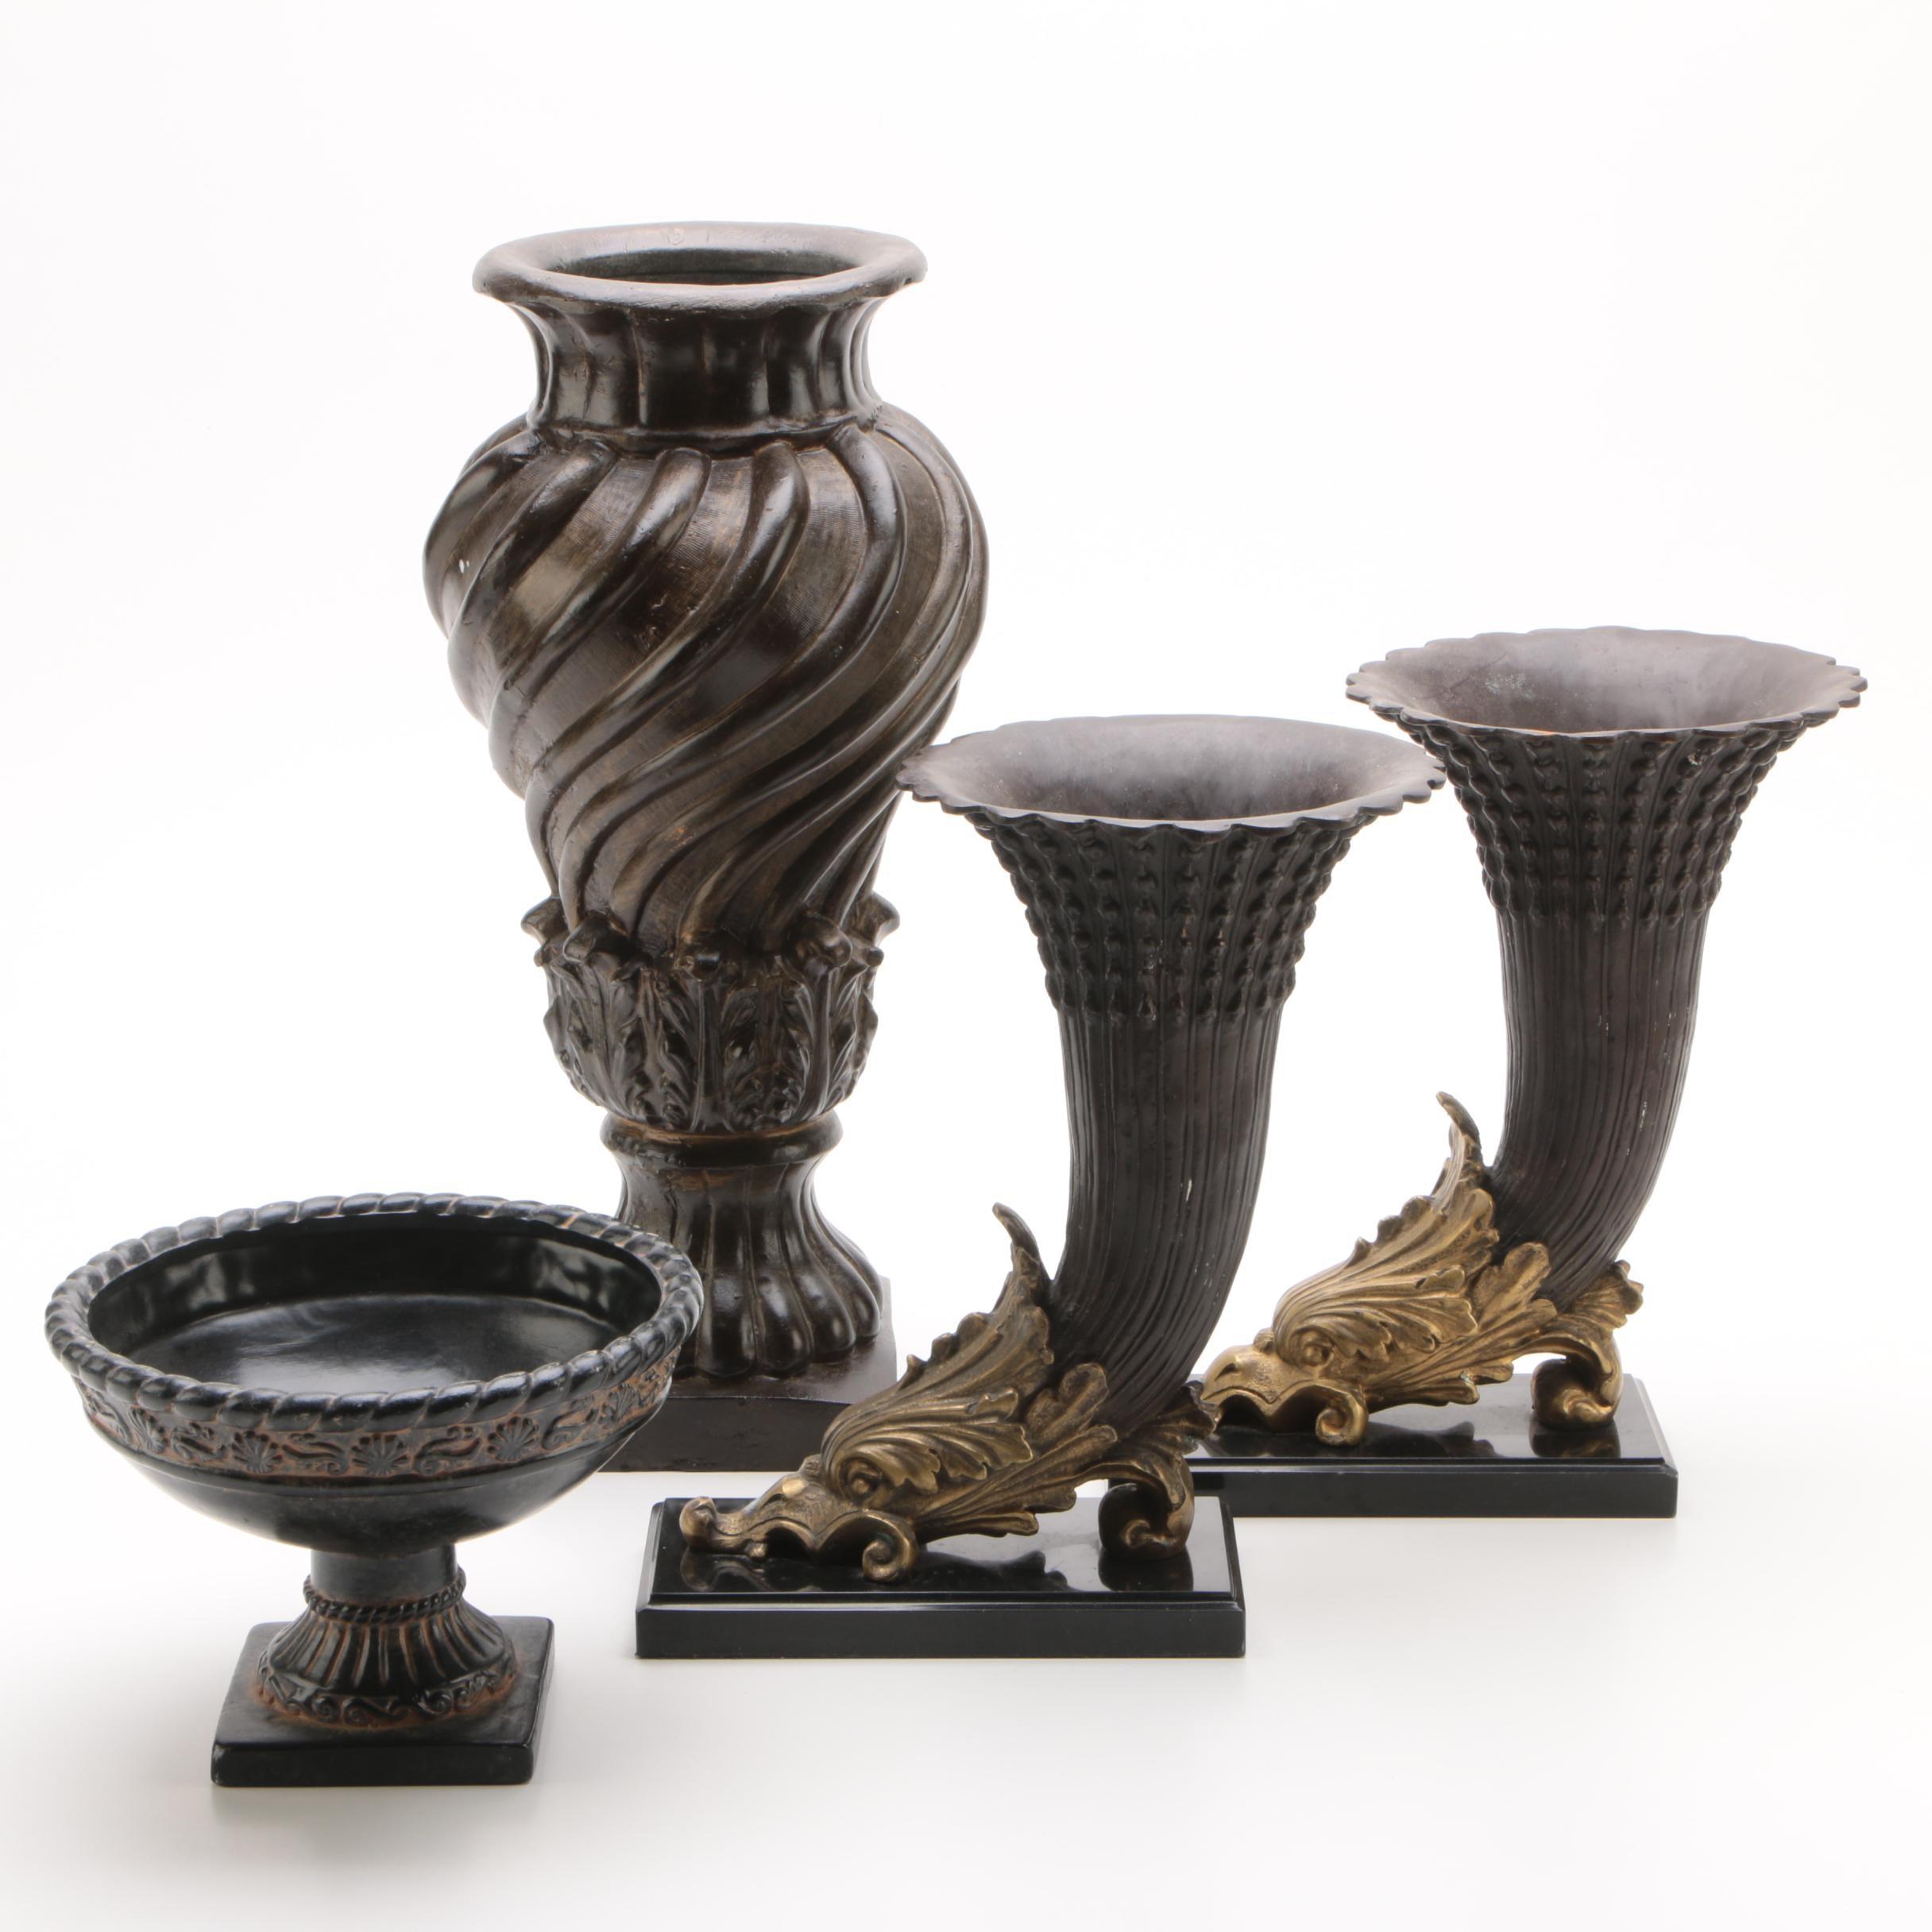 Contemporary Decorative Vases Including Cornucopias